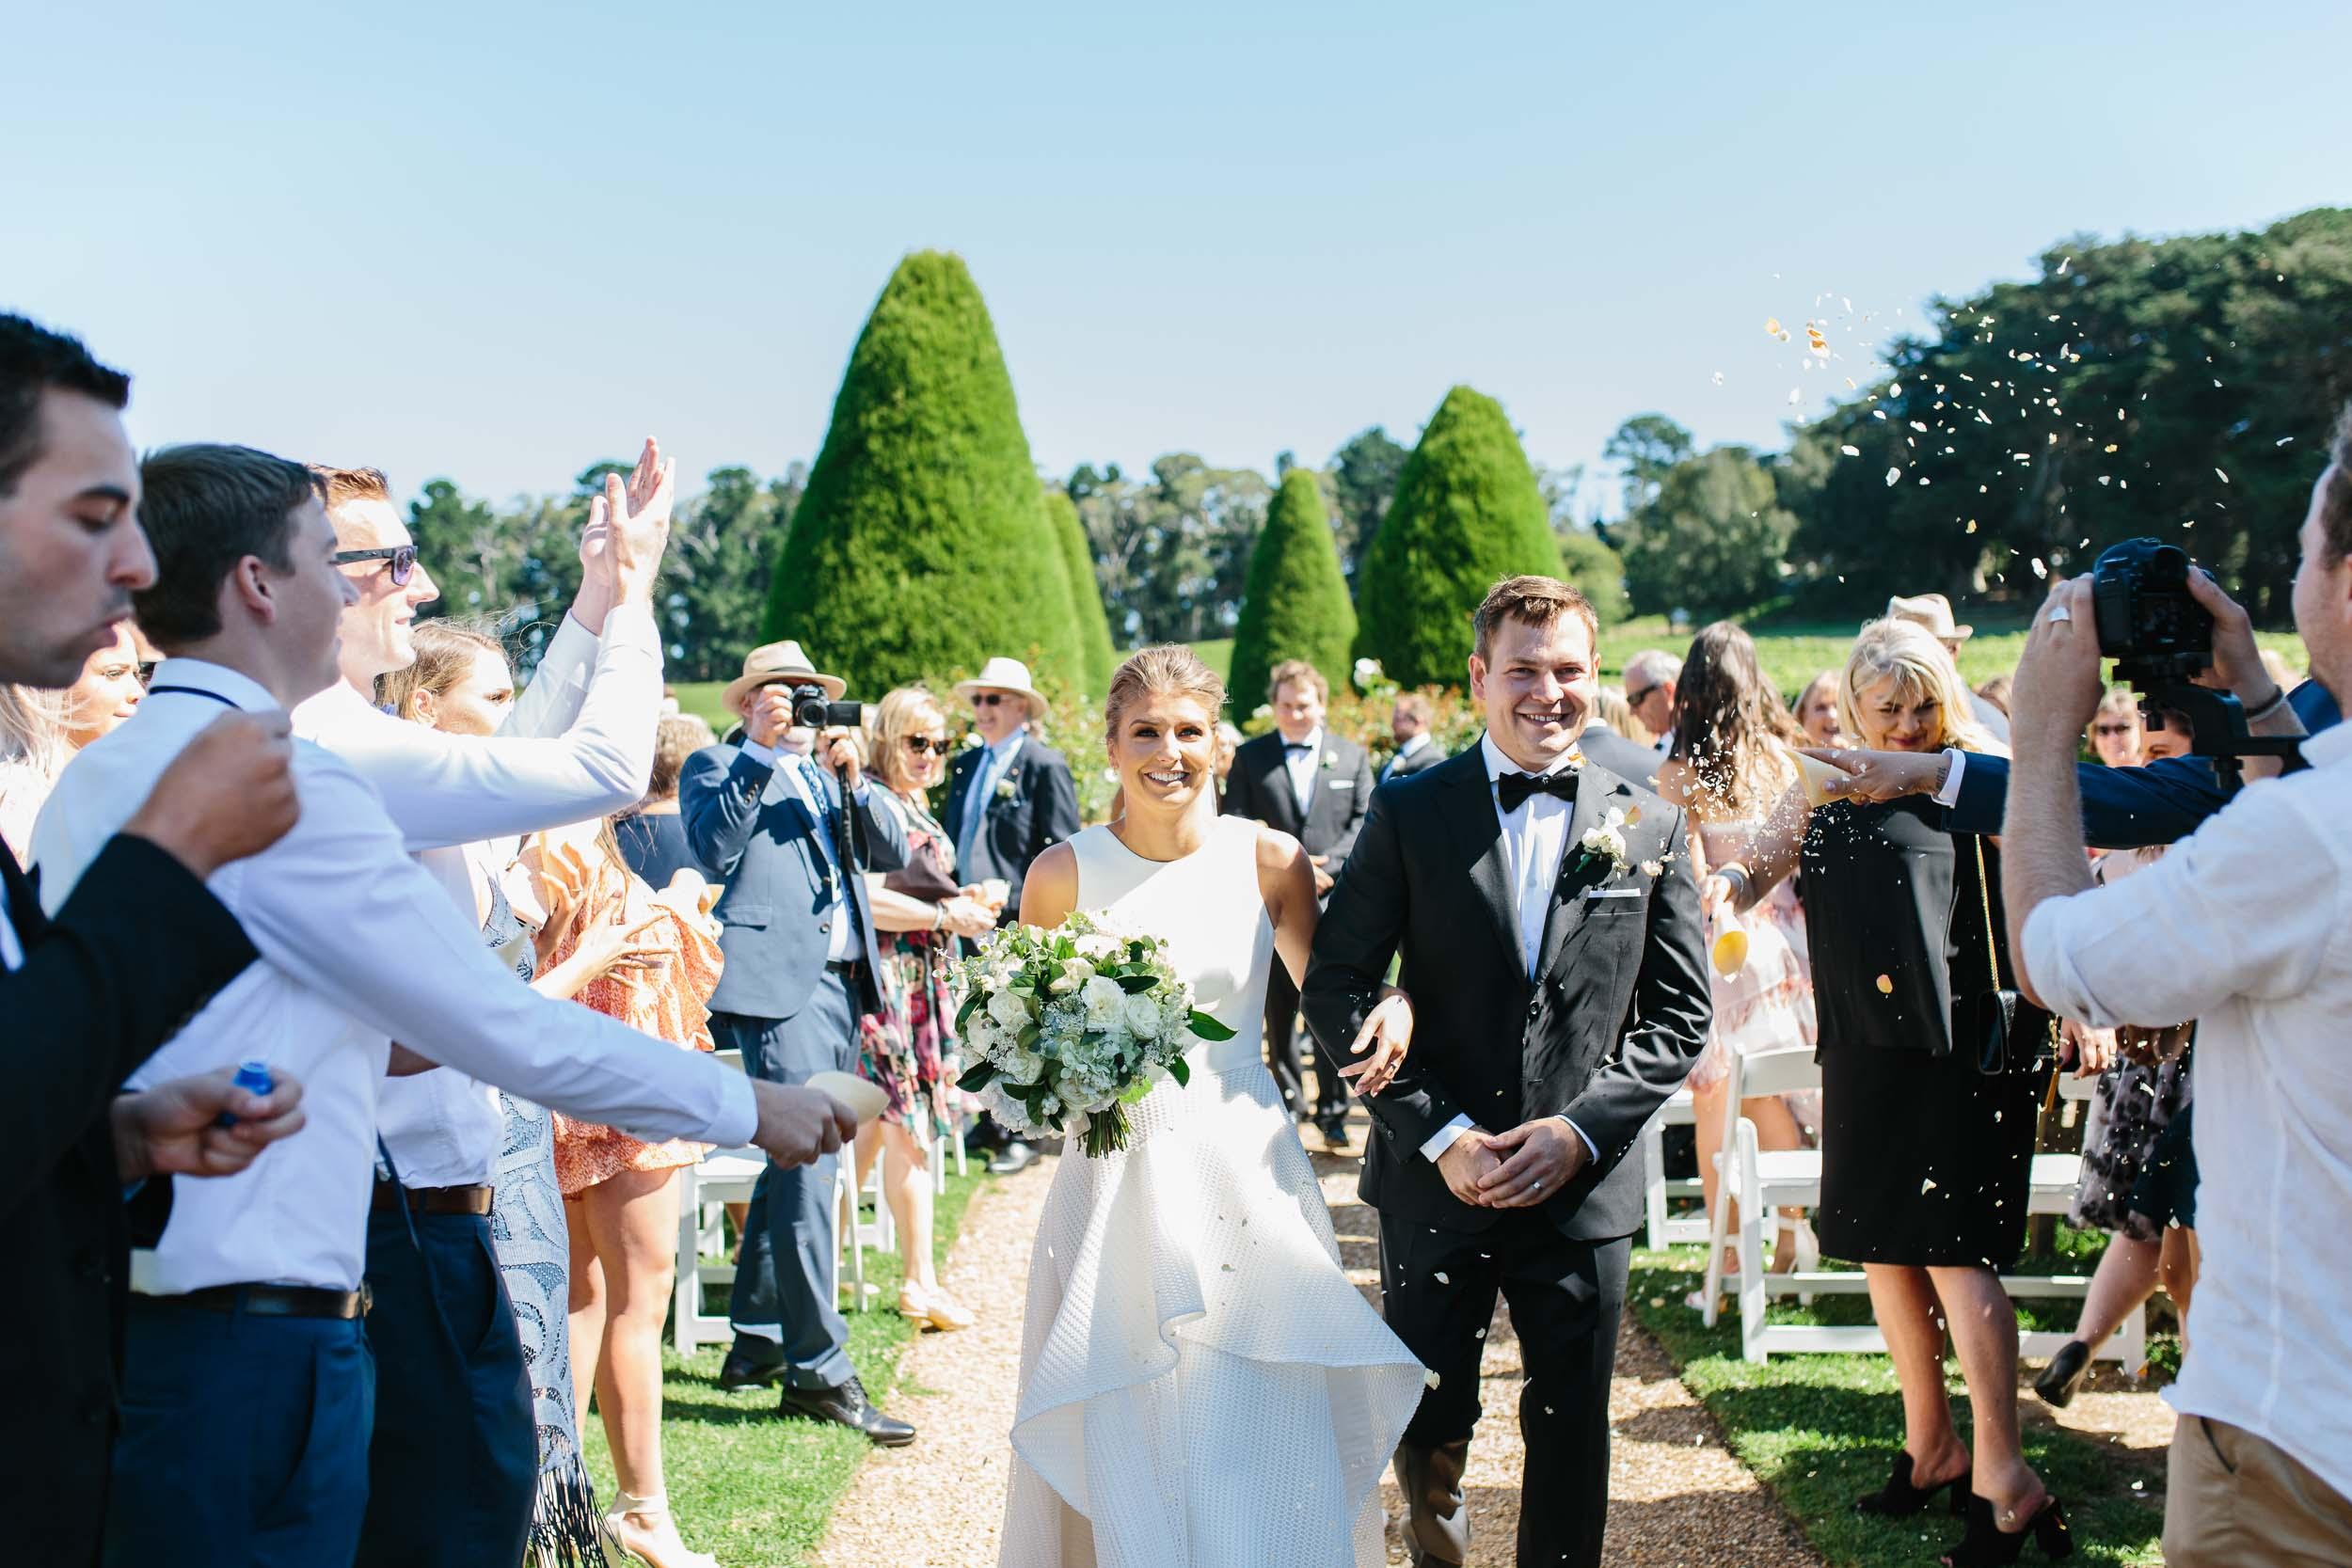 Kas-Richards-Mornington-Peninsula-Wedding-Lindenderry-Red-Hill-321.jpg